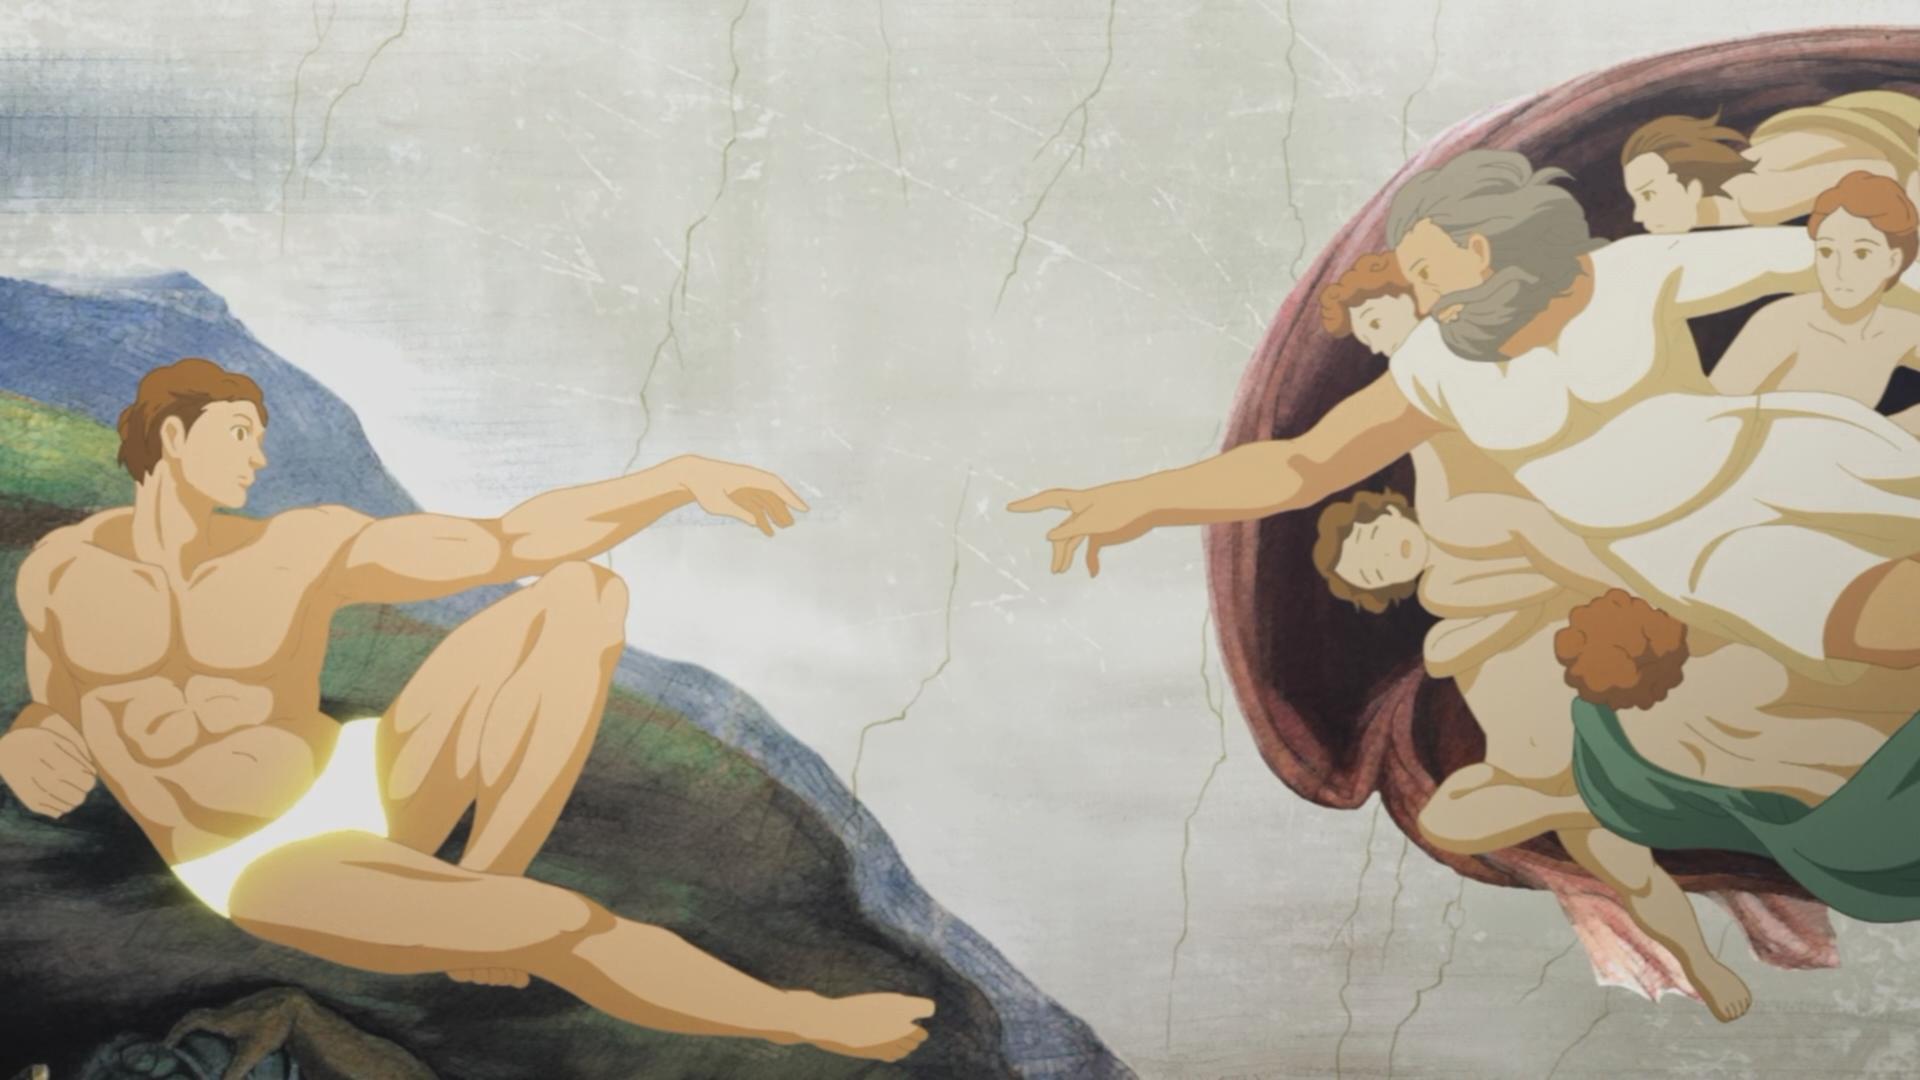 Kaguya-sama-wa-Kokurasetai-S2-07-000022-creation-of-adam